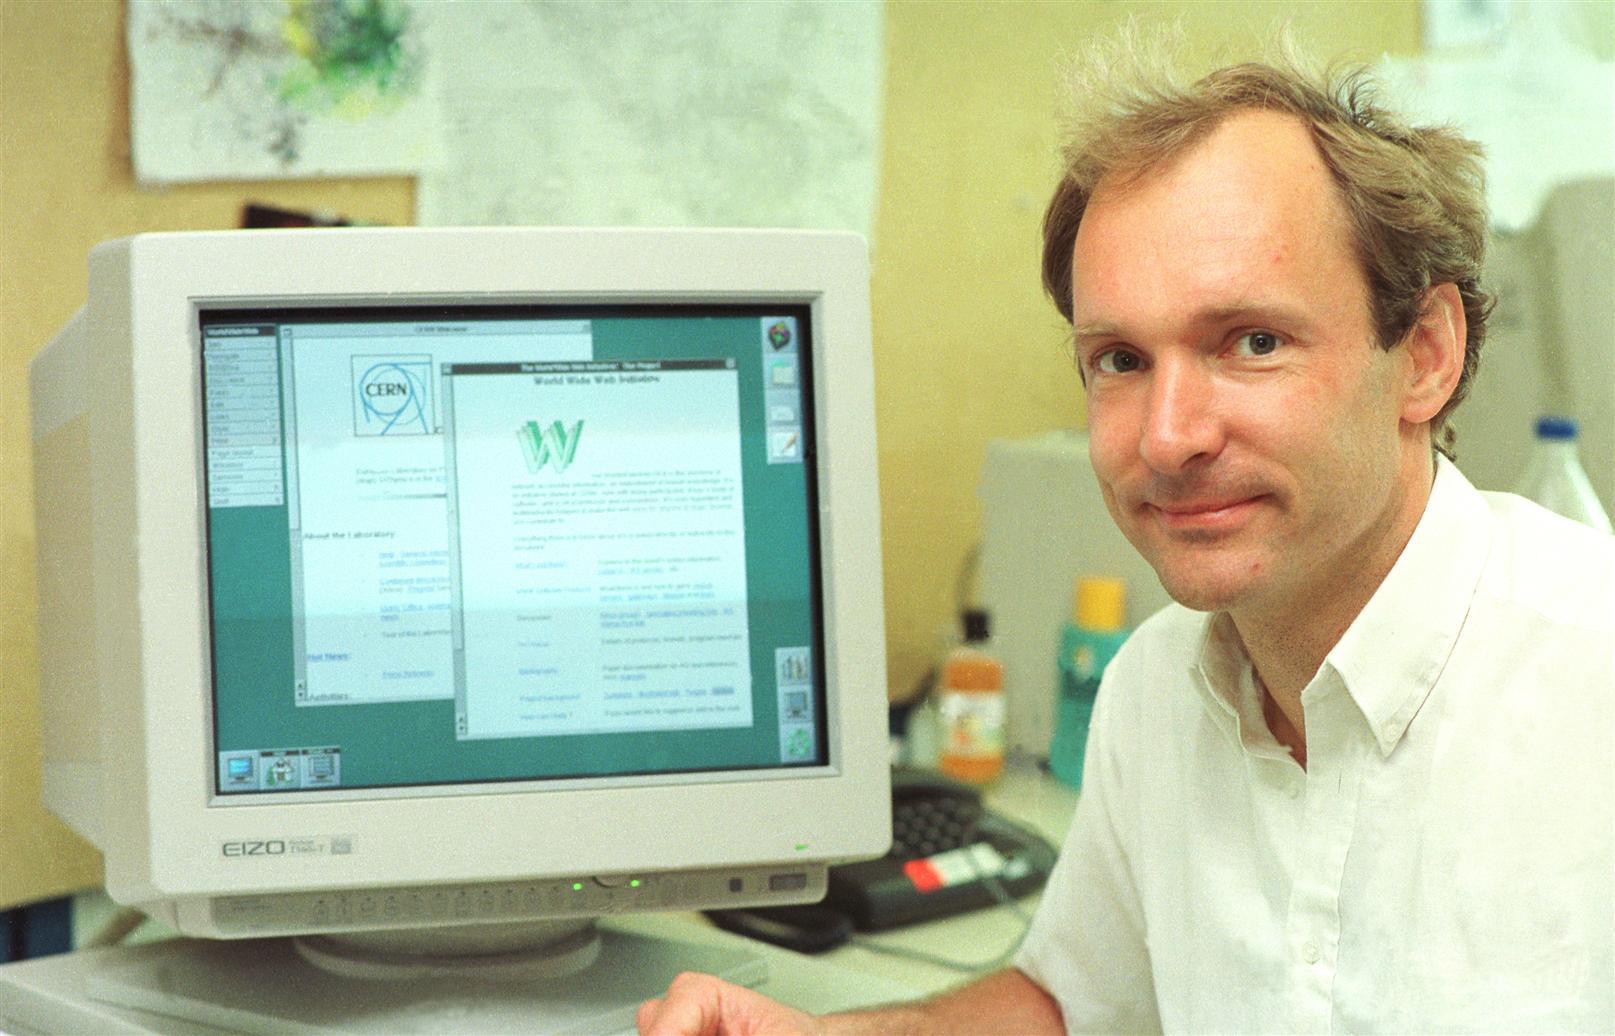 Tim Berners-Lee,criador da Web quer descentralizá-la